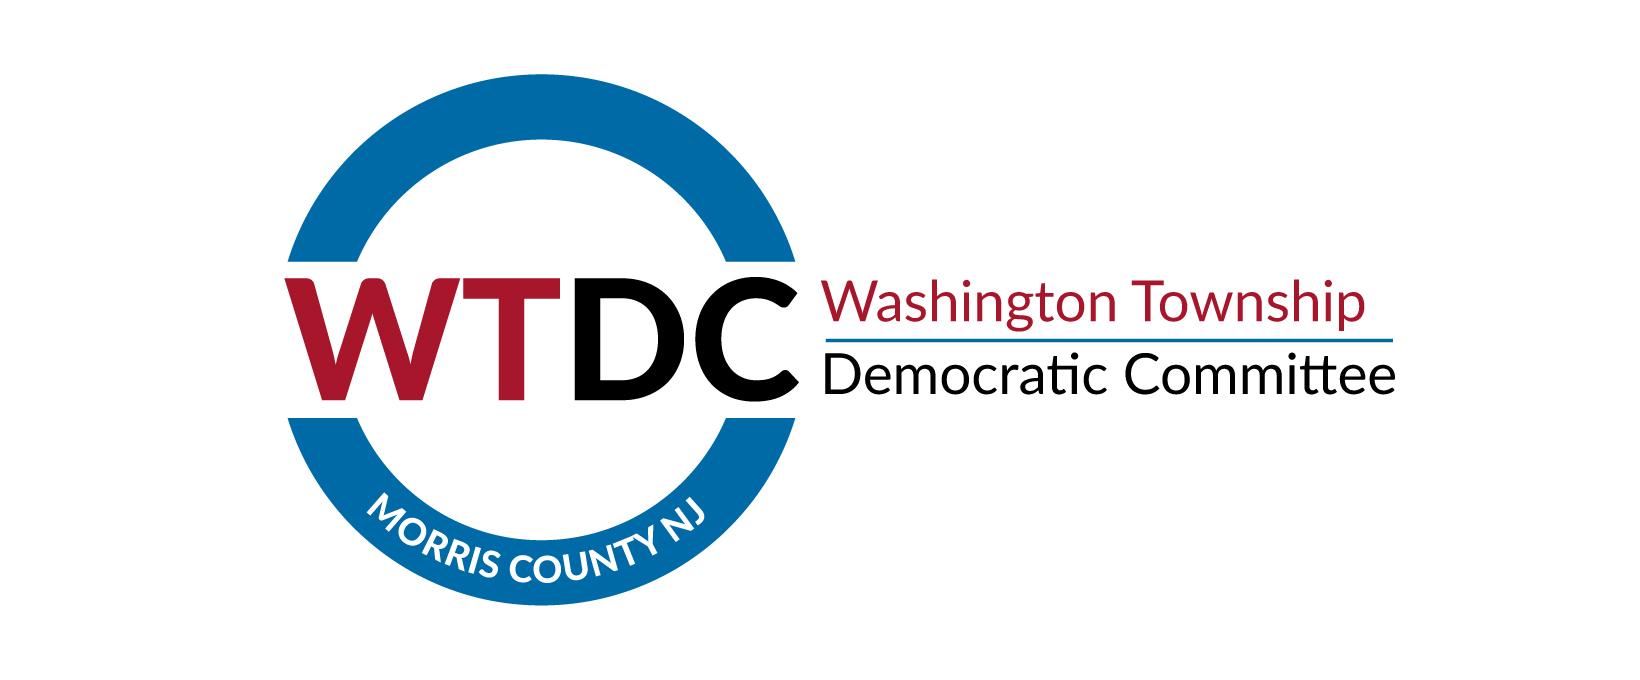 Washington Township Democratic Committee (NJ)